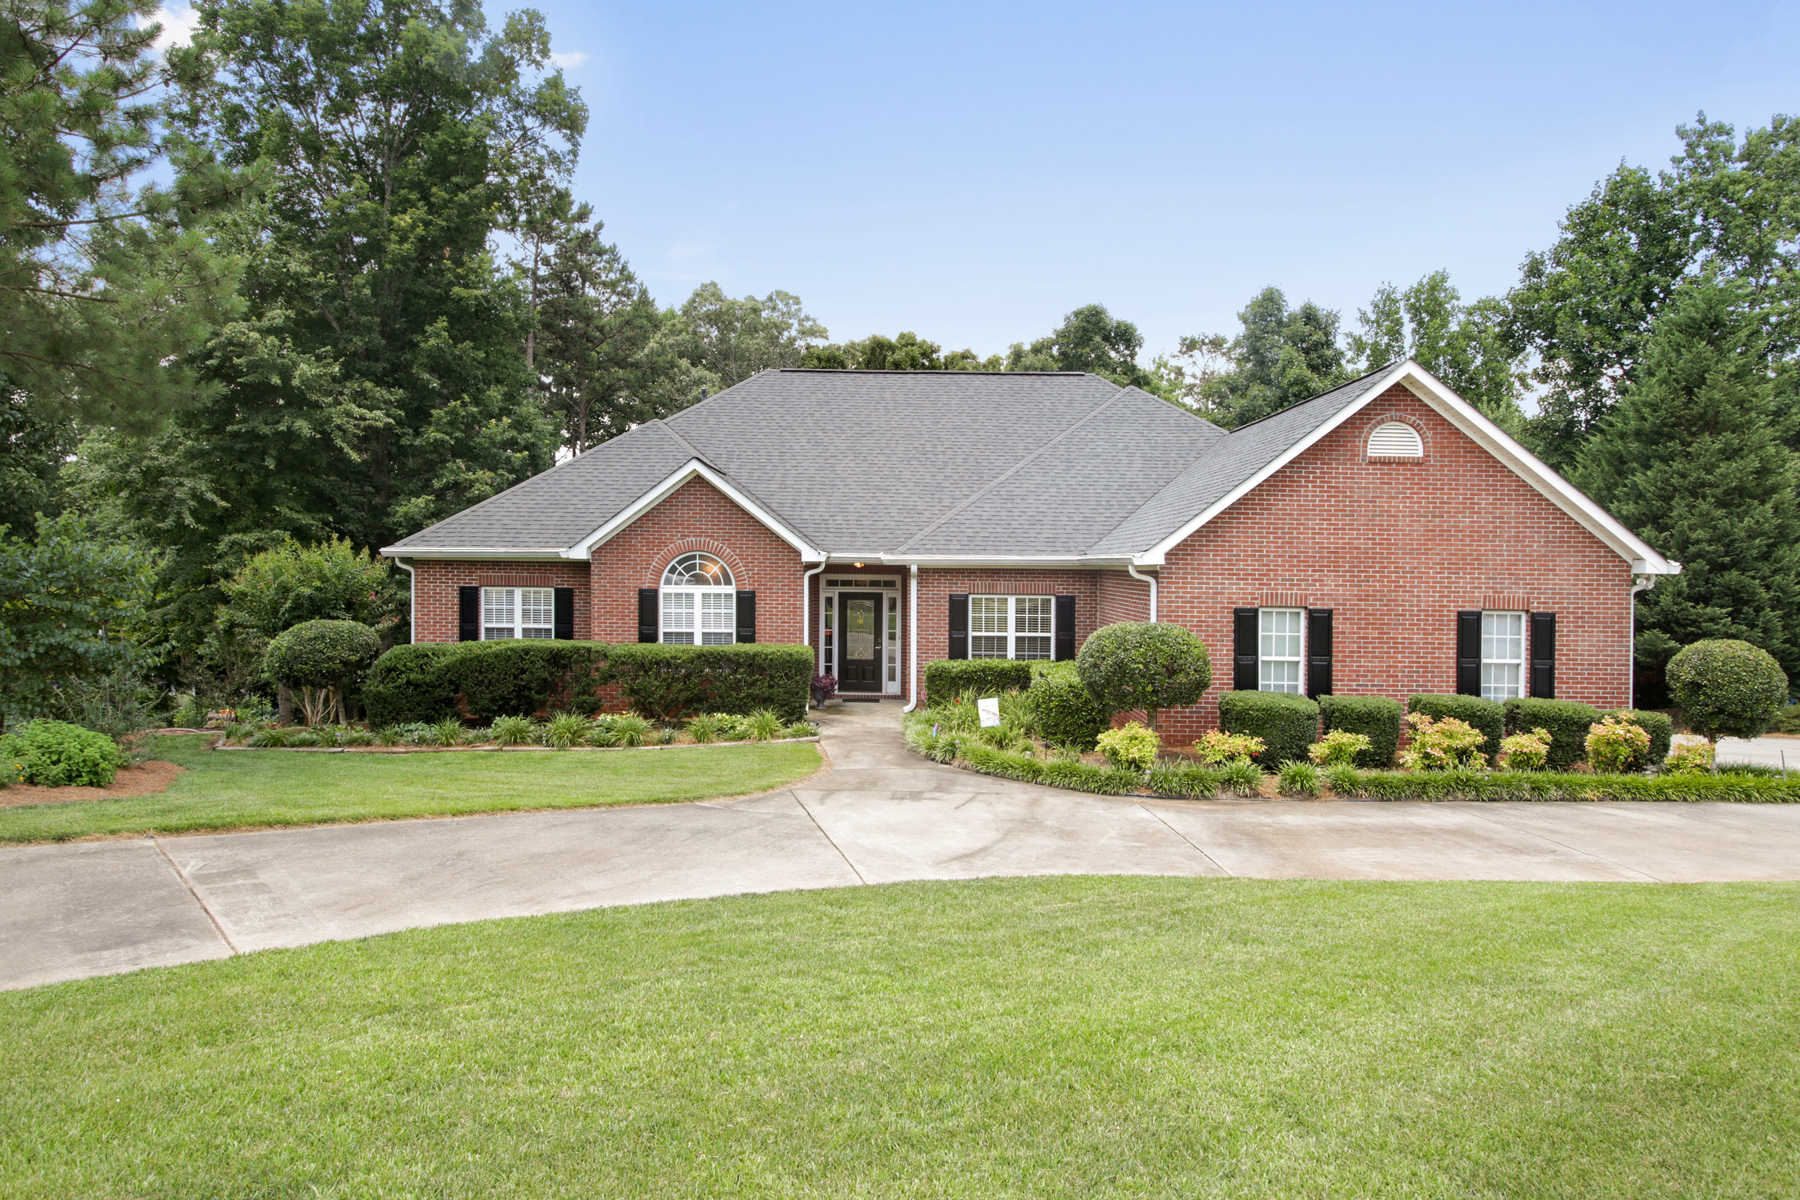 Single Family Home for Sale at Custom Home - Private Paradise 130 Lawn Market Sharpsburg, Georgia, 30277 United States